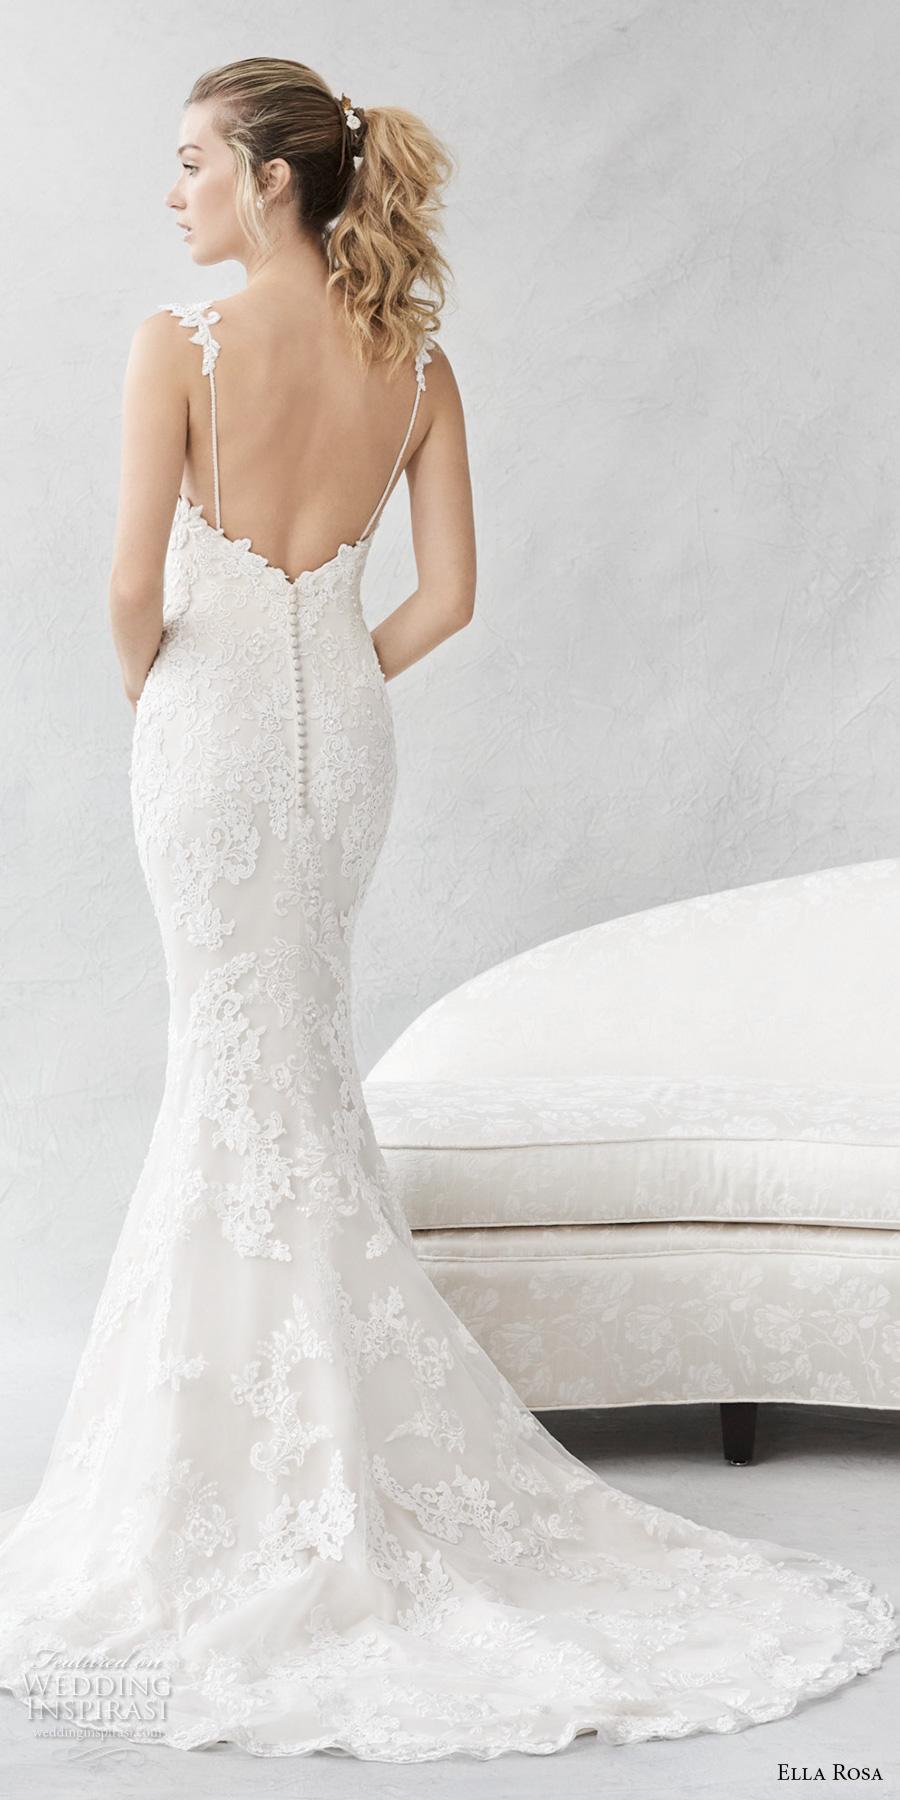 ella rosa spring 2017 bridal sleeveless embroidered strap sweetheart neckline full embellishment elegant fit and flare wedding dress open back small train (384) bv